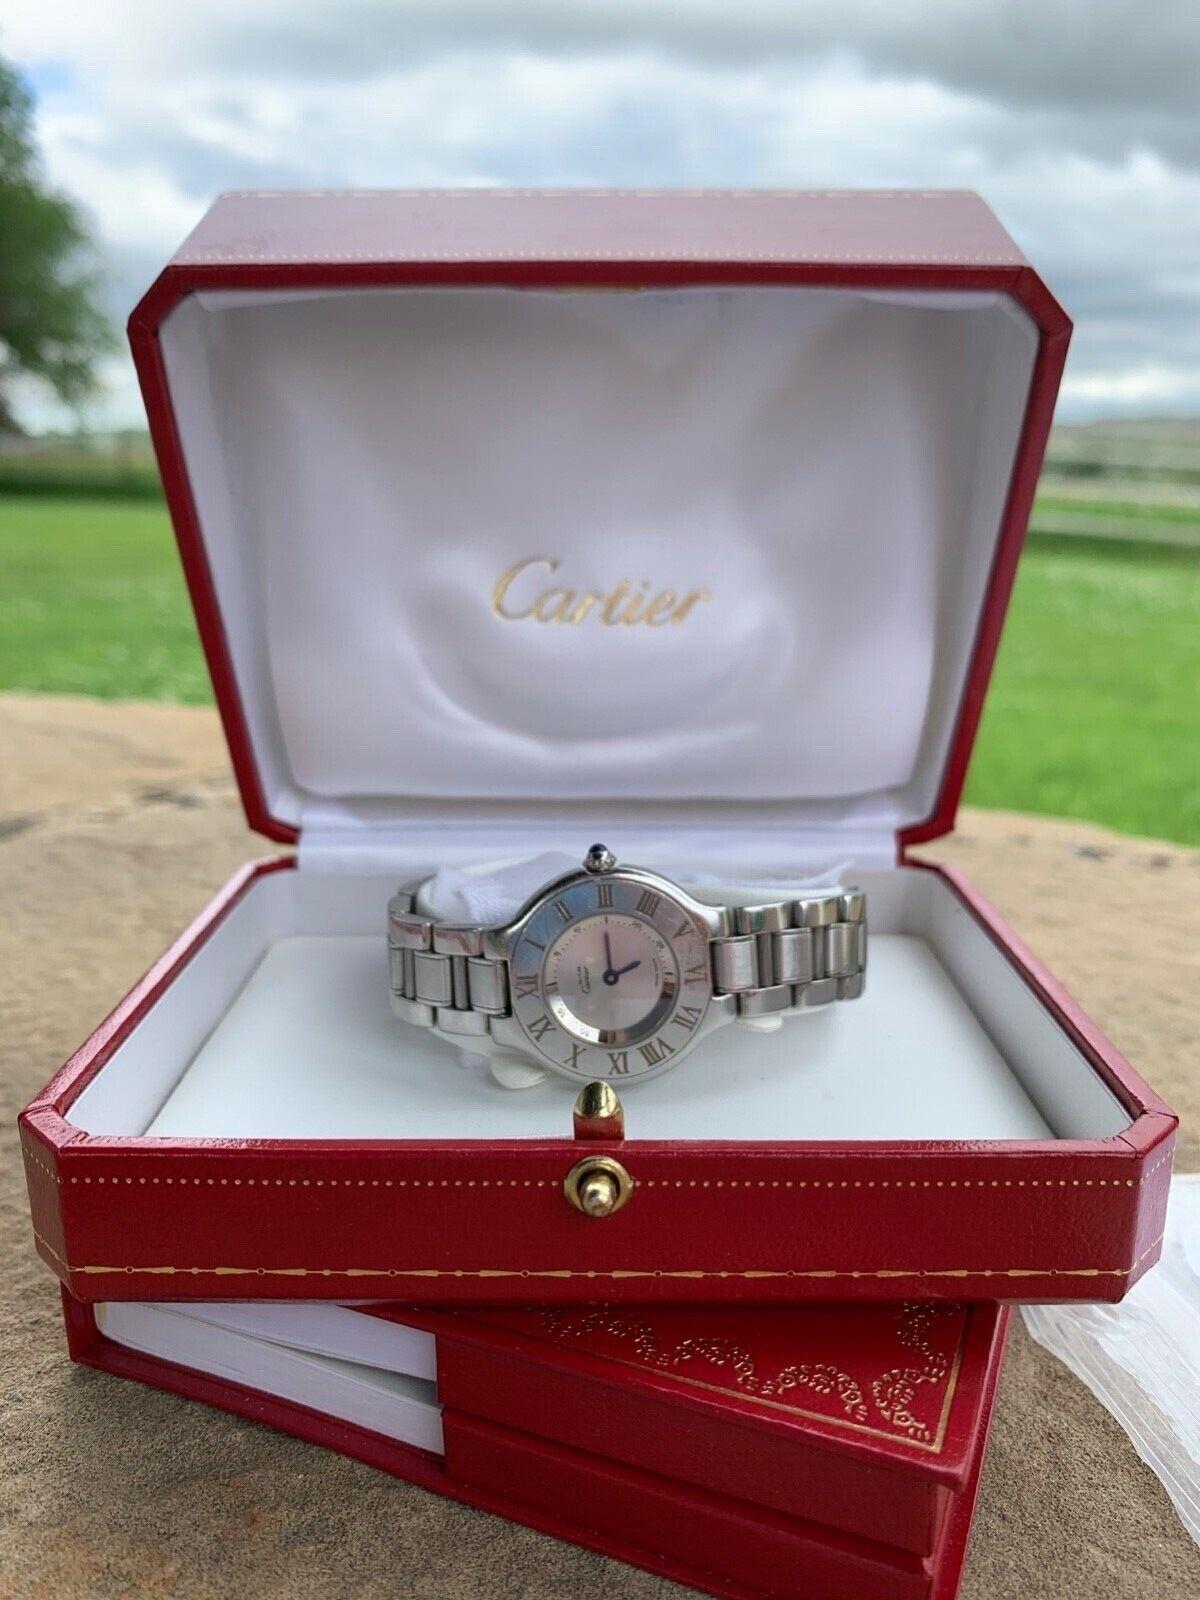 Must de Cartier 1340 stainless steel 21 Women's wristwatch